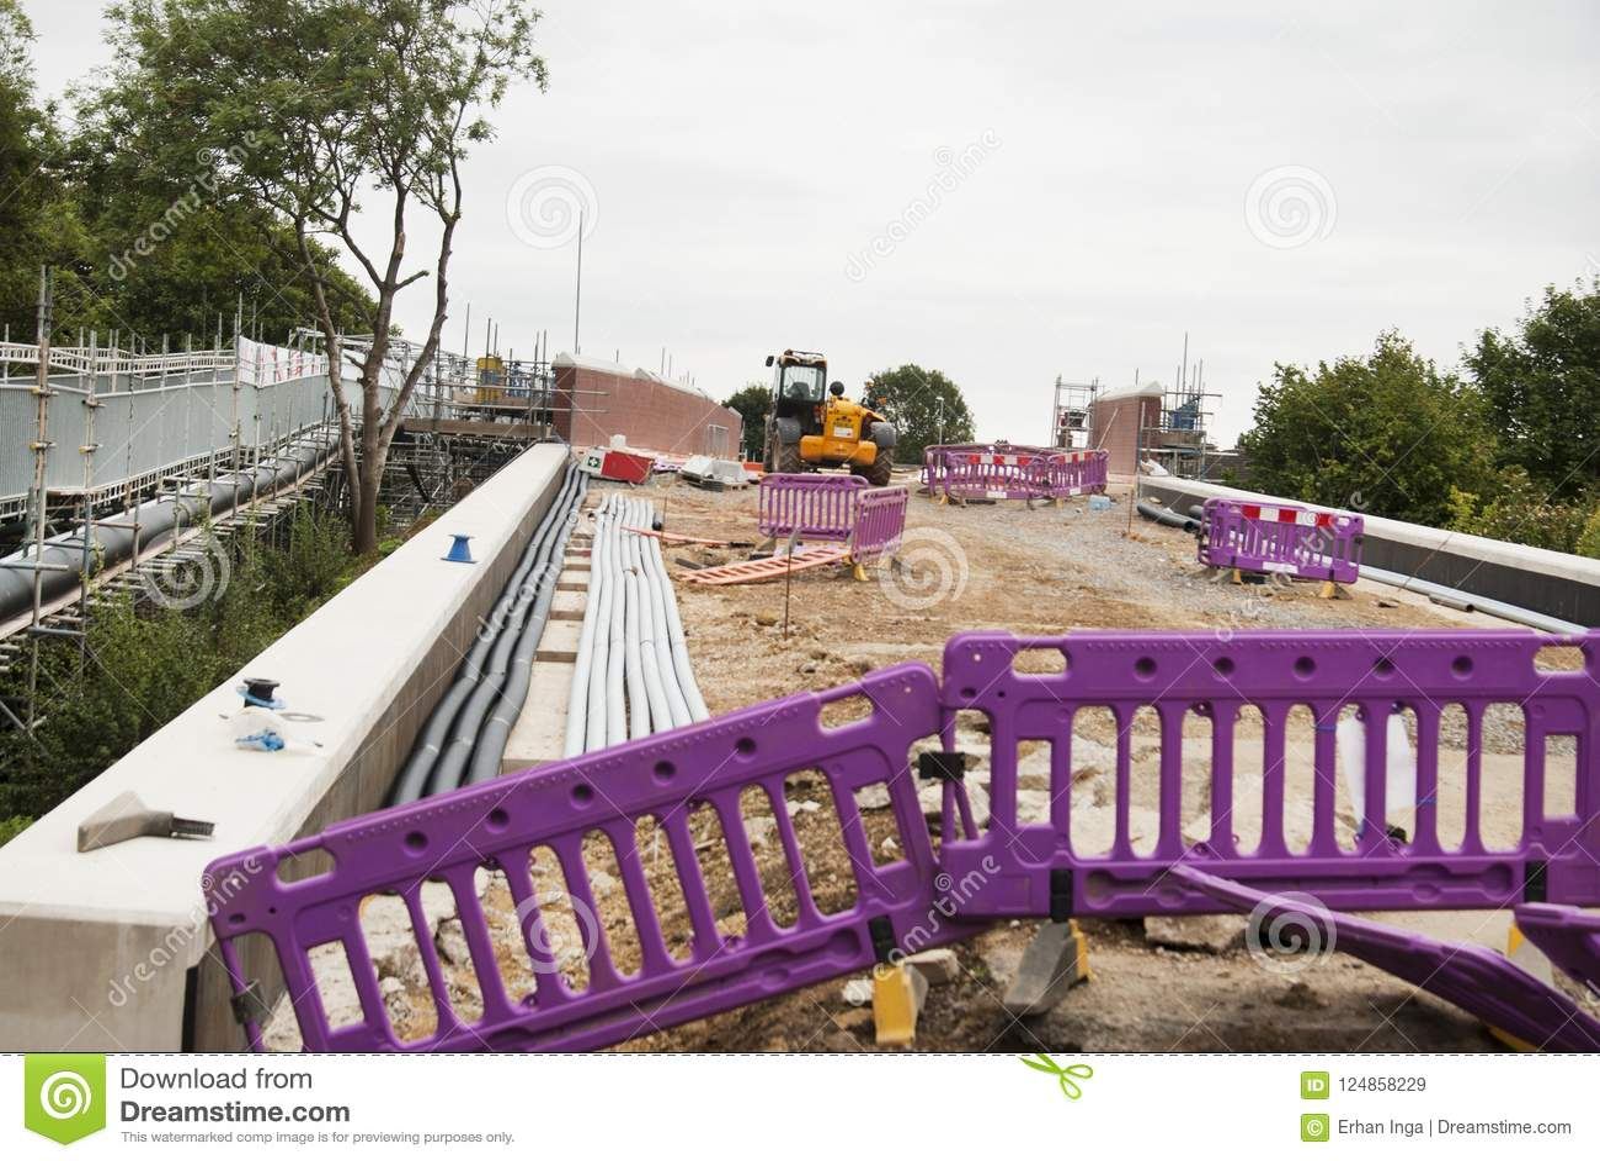 Corby, Ηνωμένο Βασίλειο - 29 Αυγούστου 2018: Επισκευή γεφυρών Υποστήριξη Metallicheskie της γέφυρας Εκτελεσμένη σχεδιασμένη εργασ